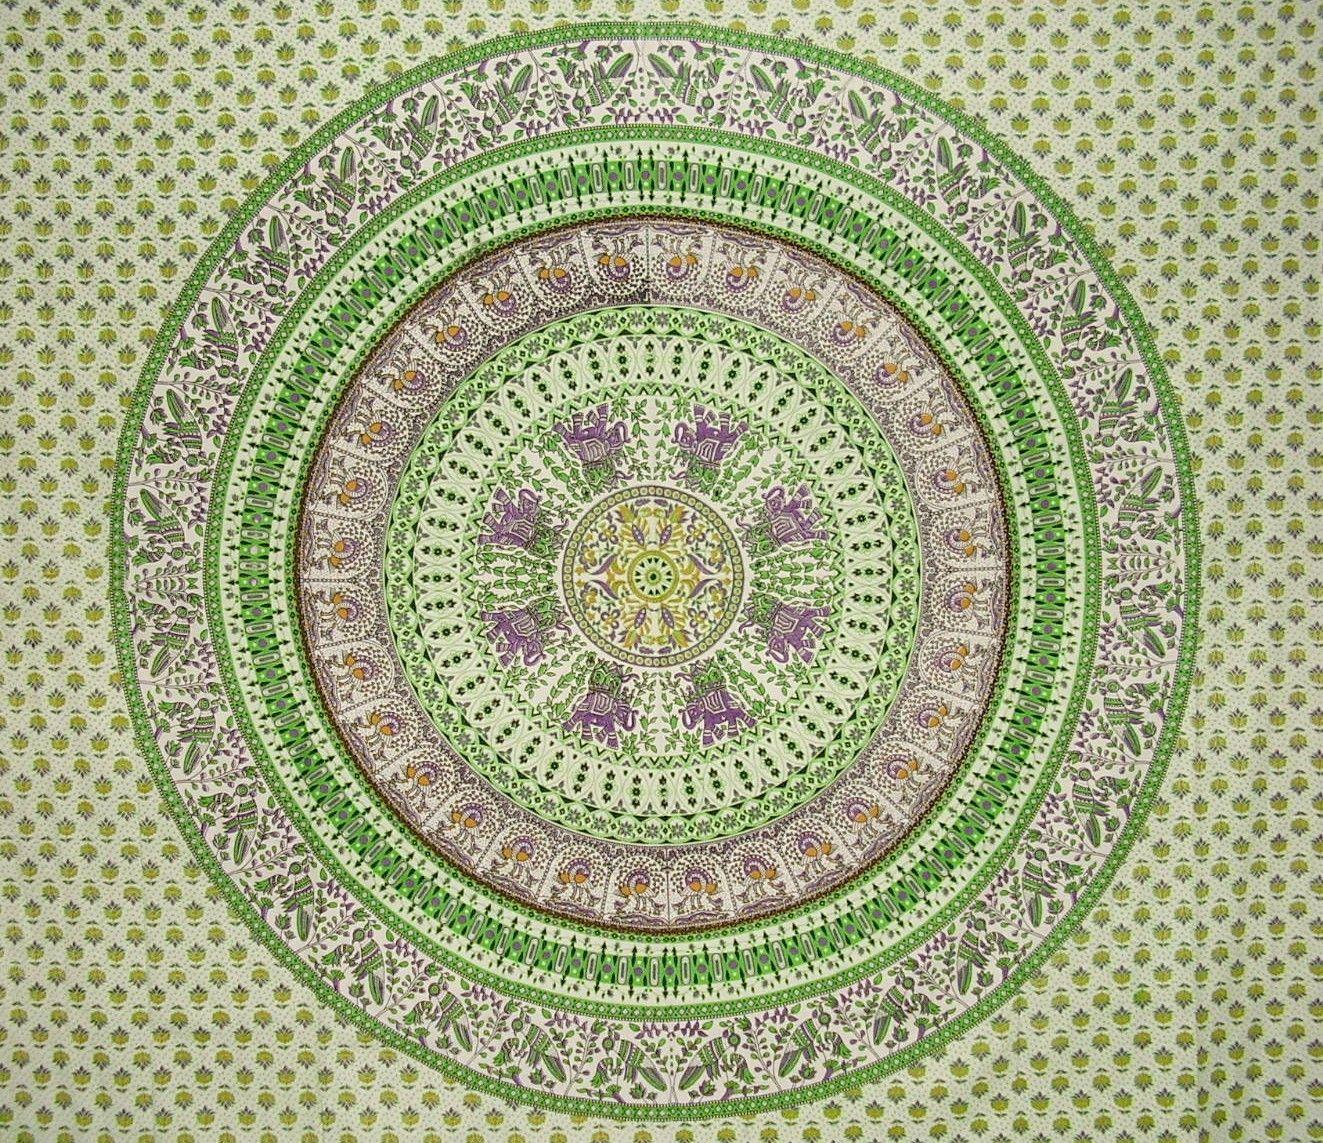 "Mandala Indian Tapestry Cotton Bedspread 96"" x 86"" Full Green"